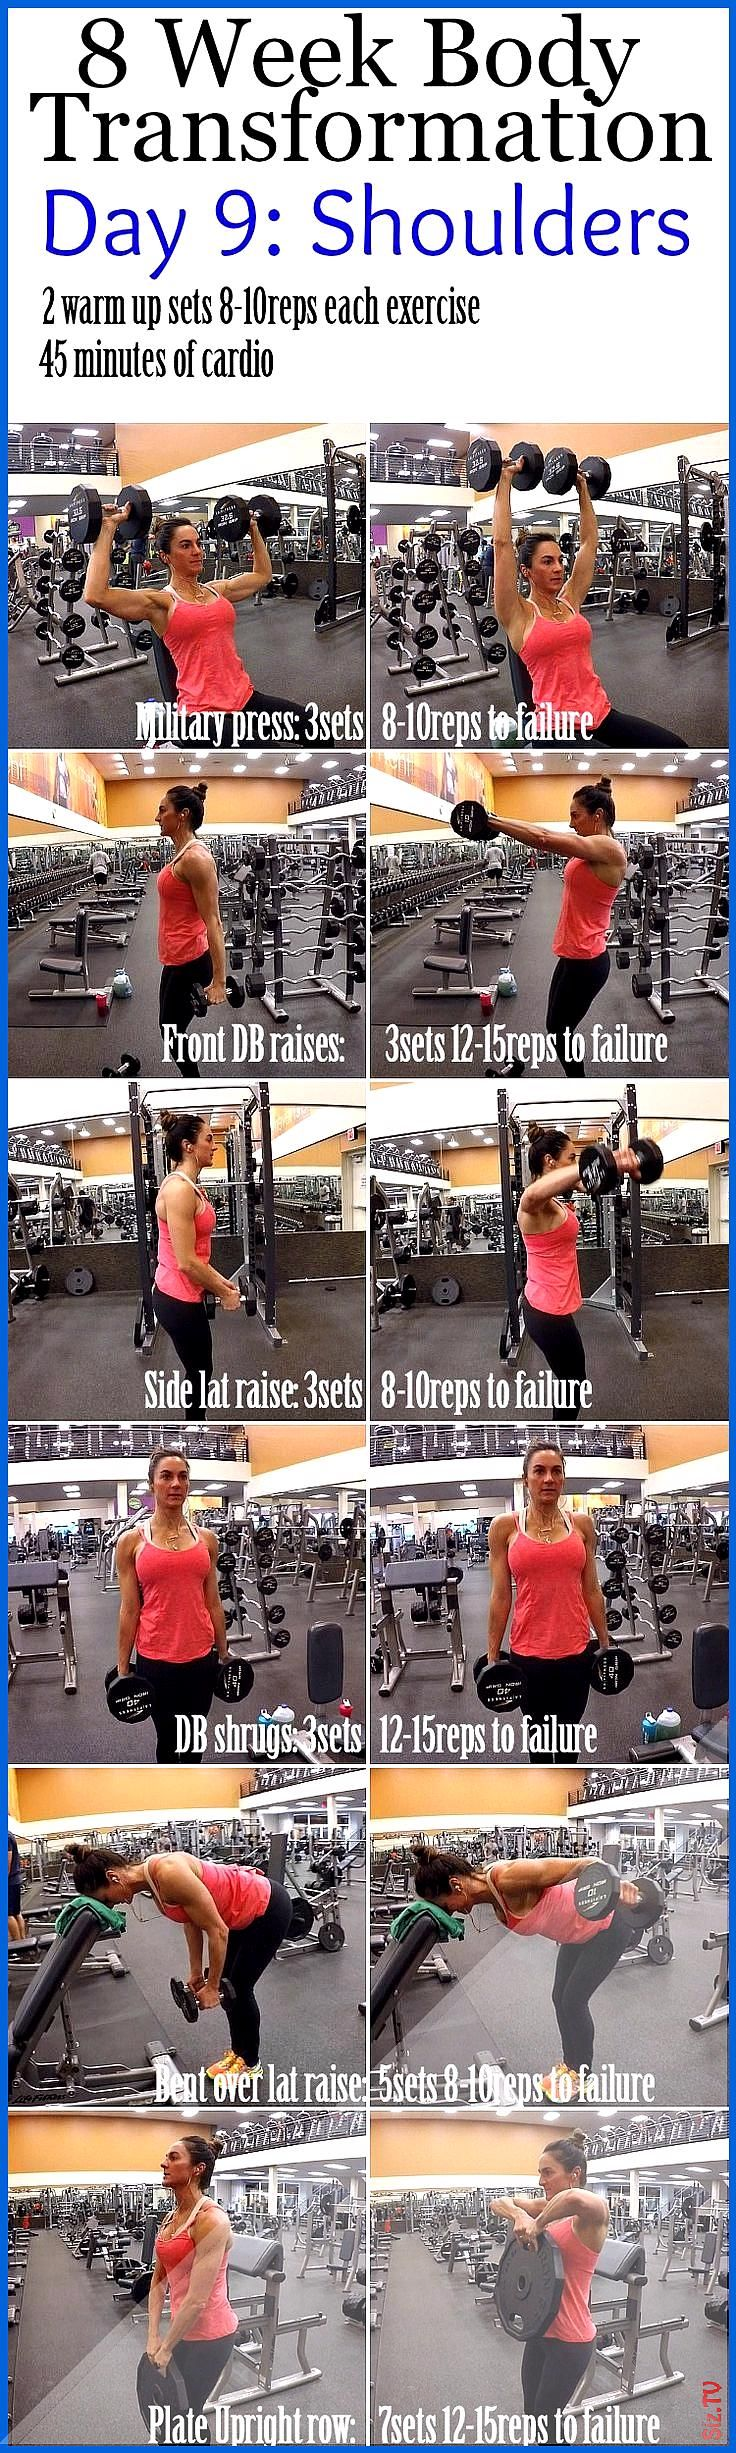 8 Week Body Transformation Day 9 Shoulders  Fitness Food Diva 8 Week Body Transformation Day 9 Shoul...